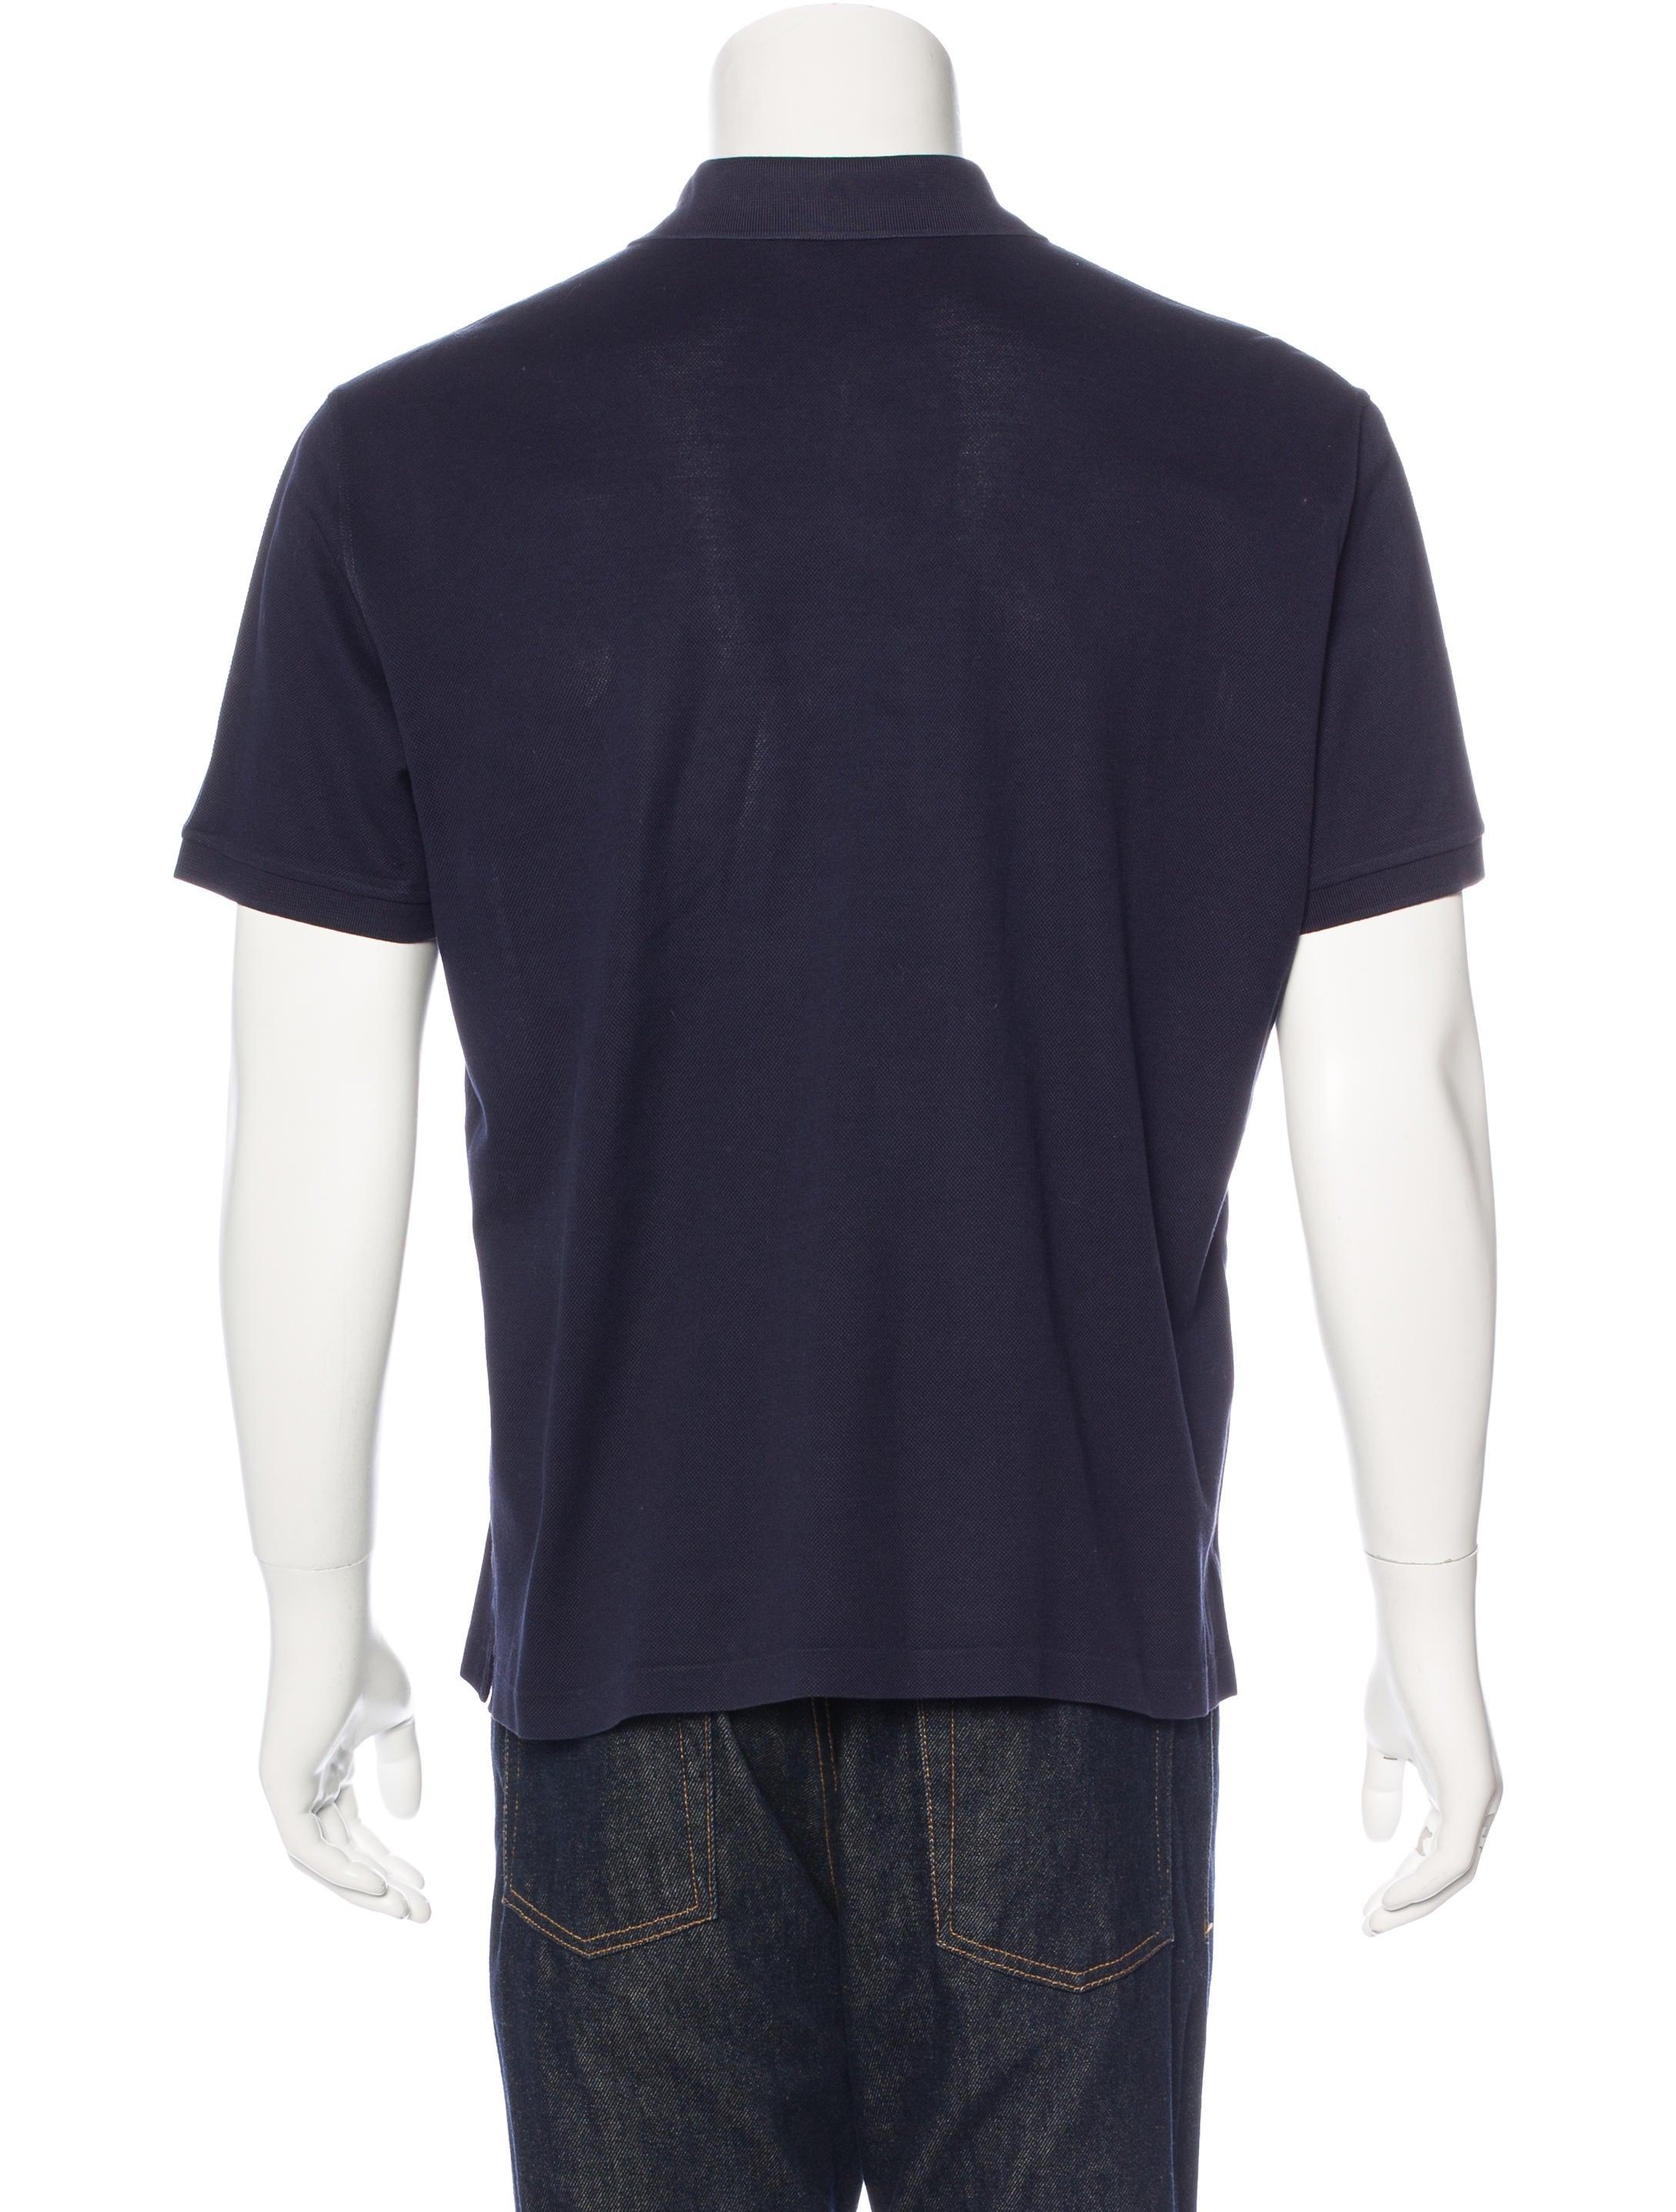 Ralph lauren purple label piqu polo shirt clothing for Ralph lauren black label polo shirt